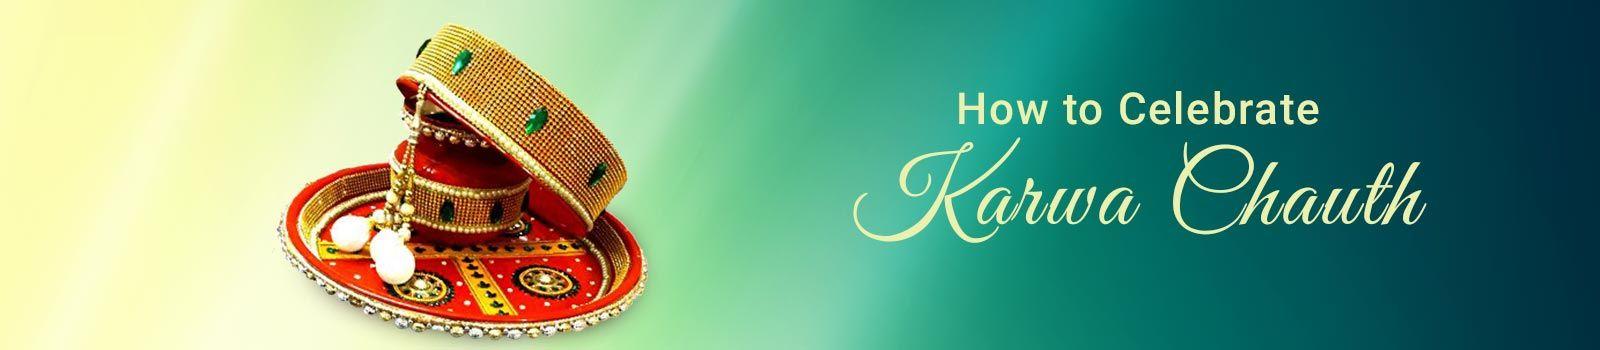 How Karwa Chauth Is Celebrated?